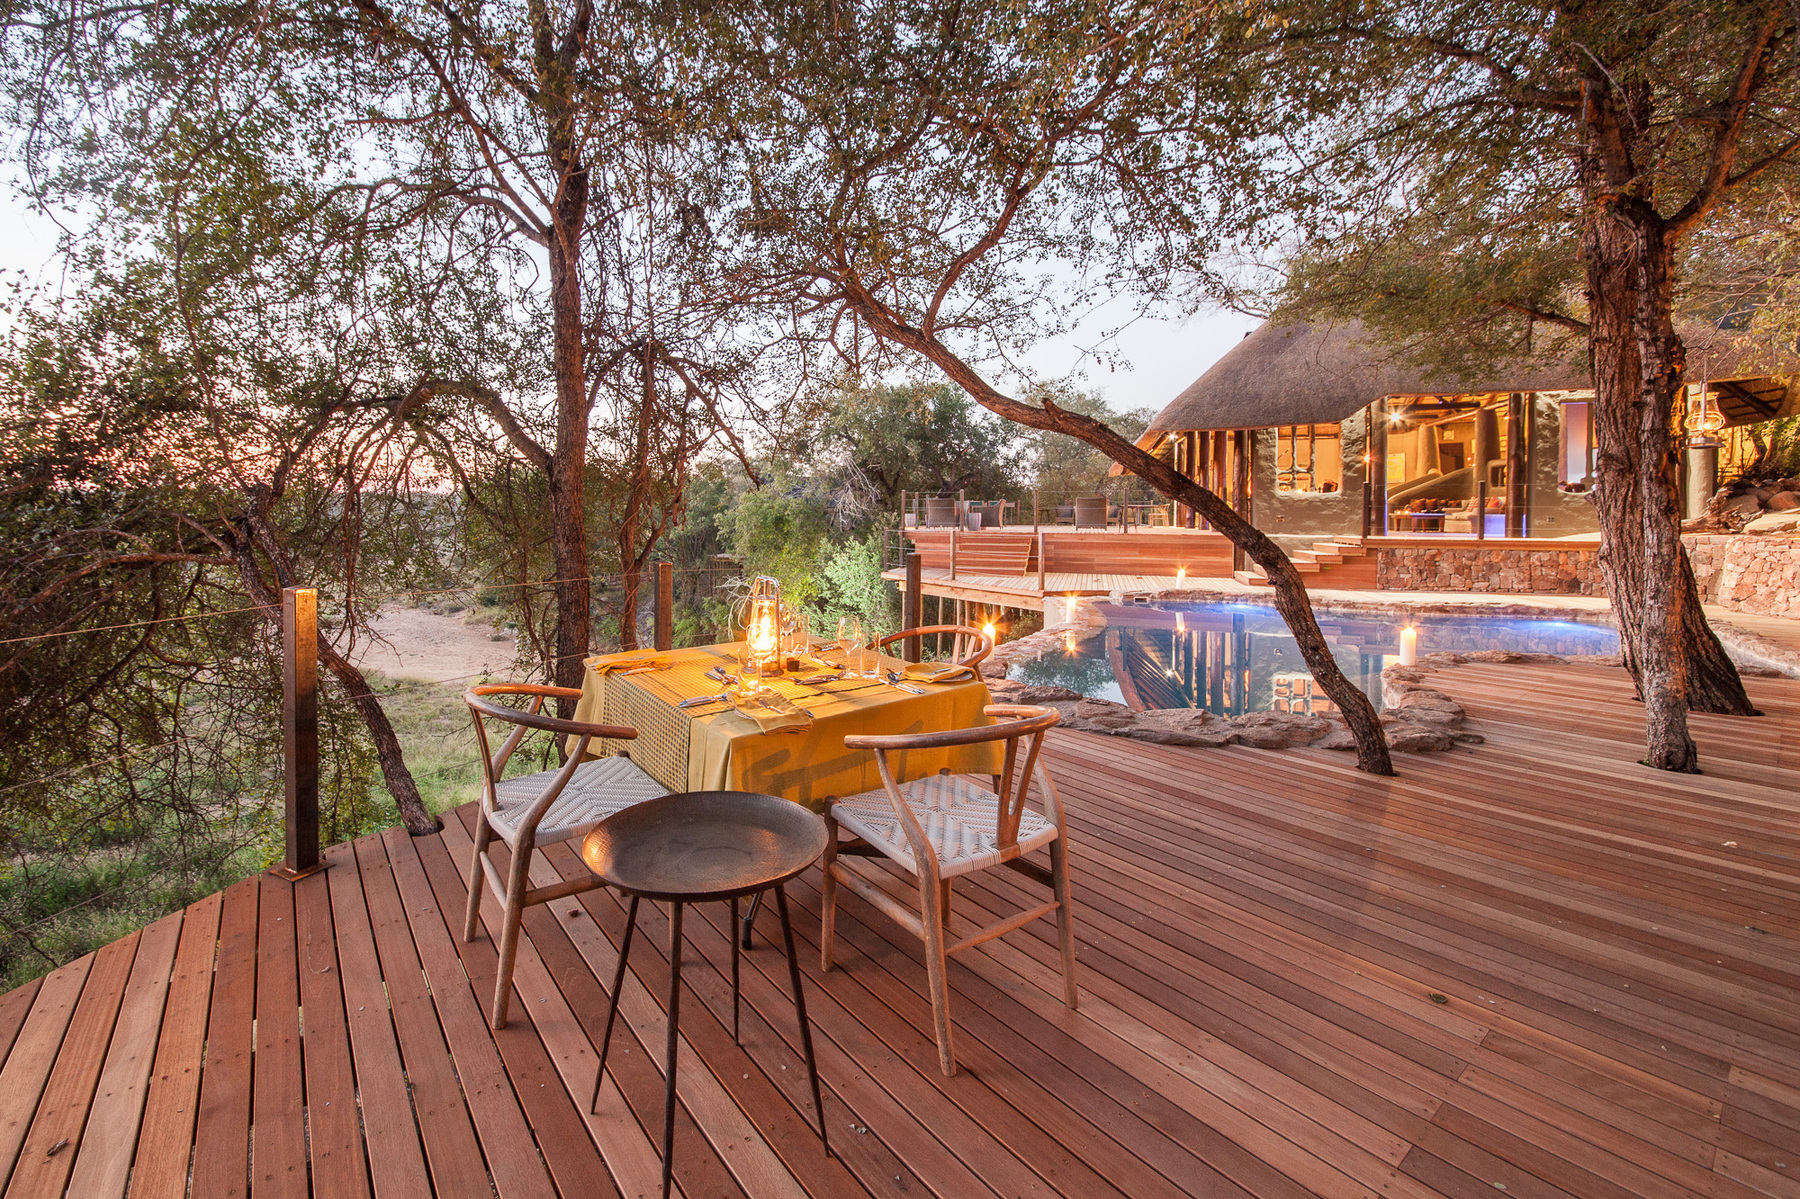 Se ubica en Sudáfrica / Garonga Safari Camp